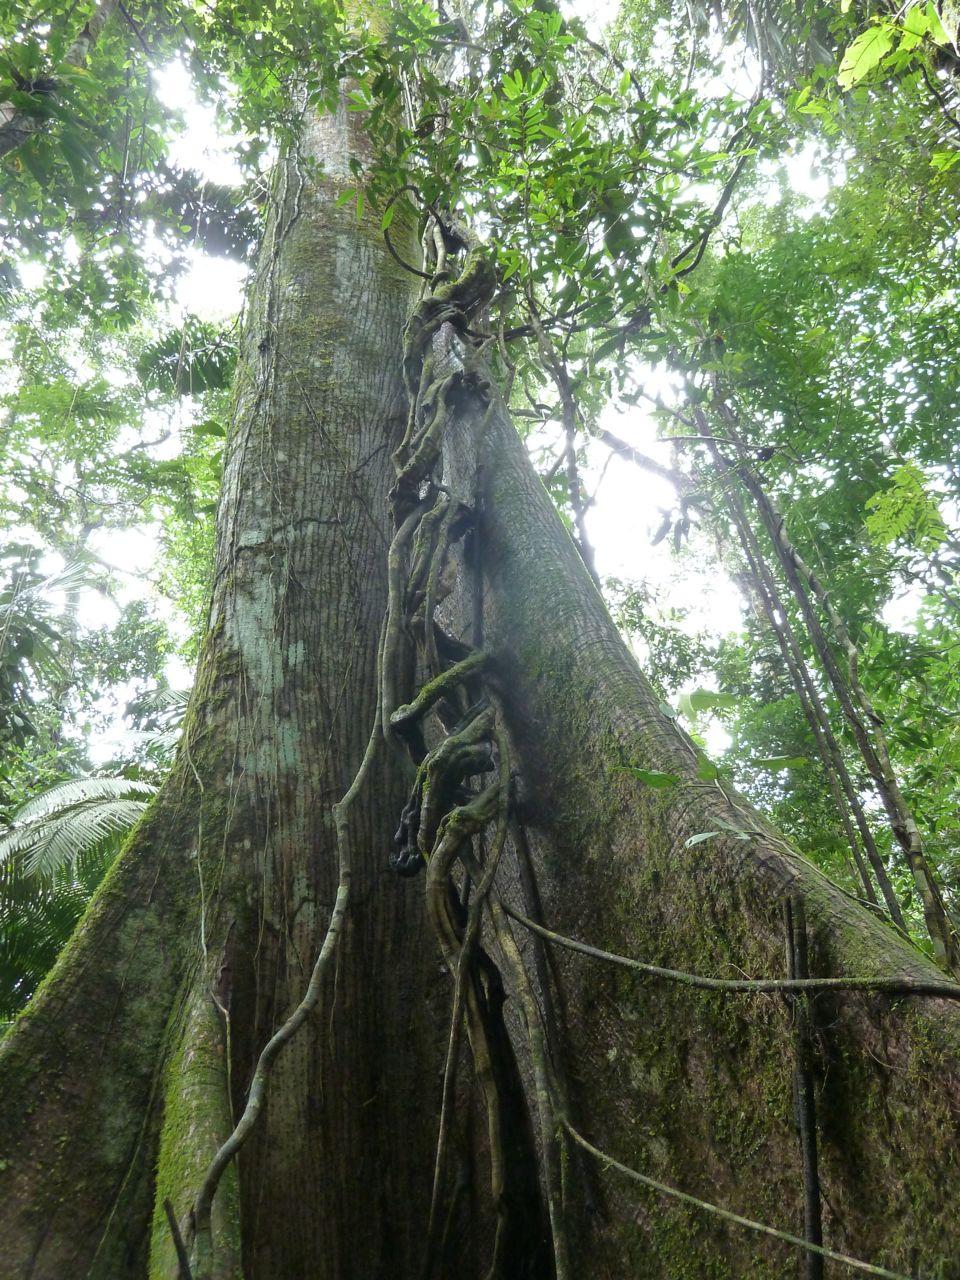 Tree in the Amazon